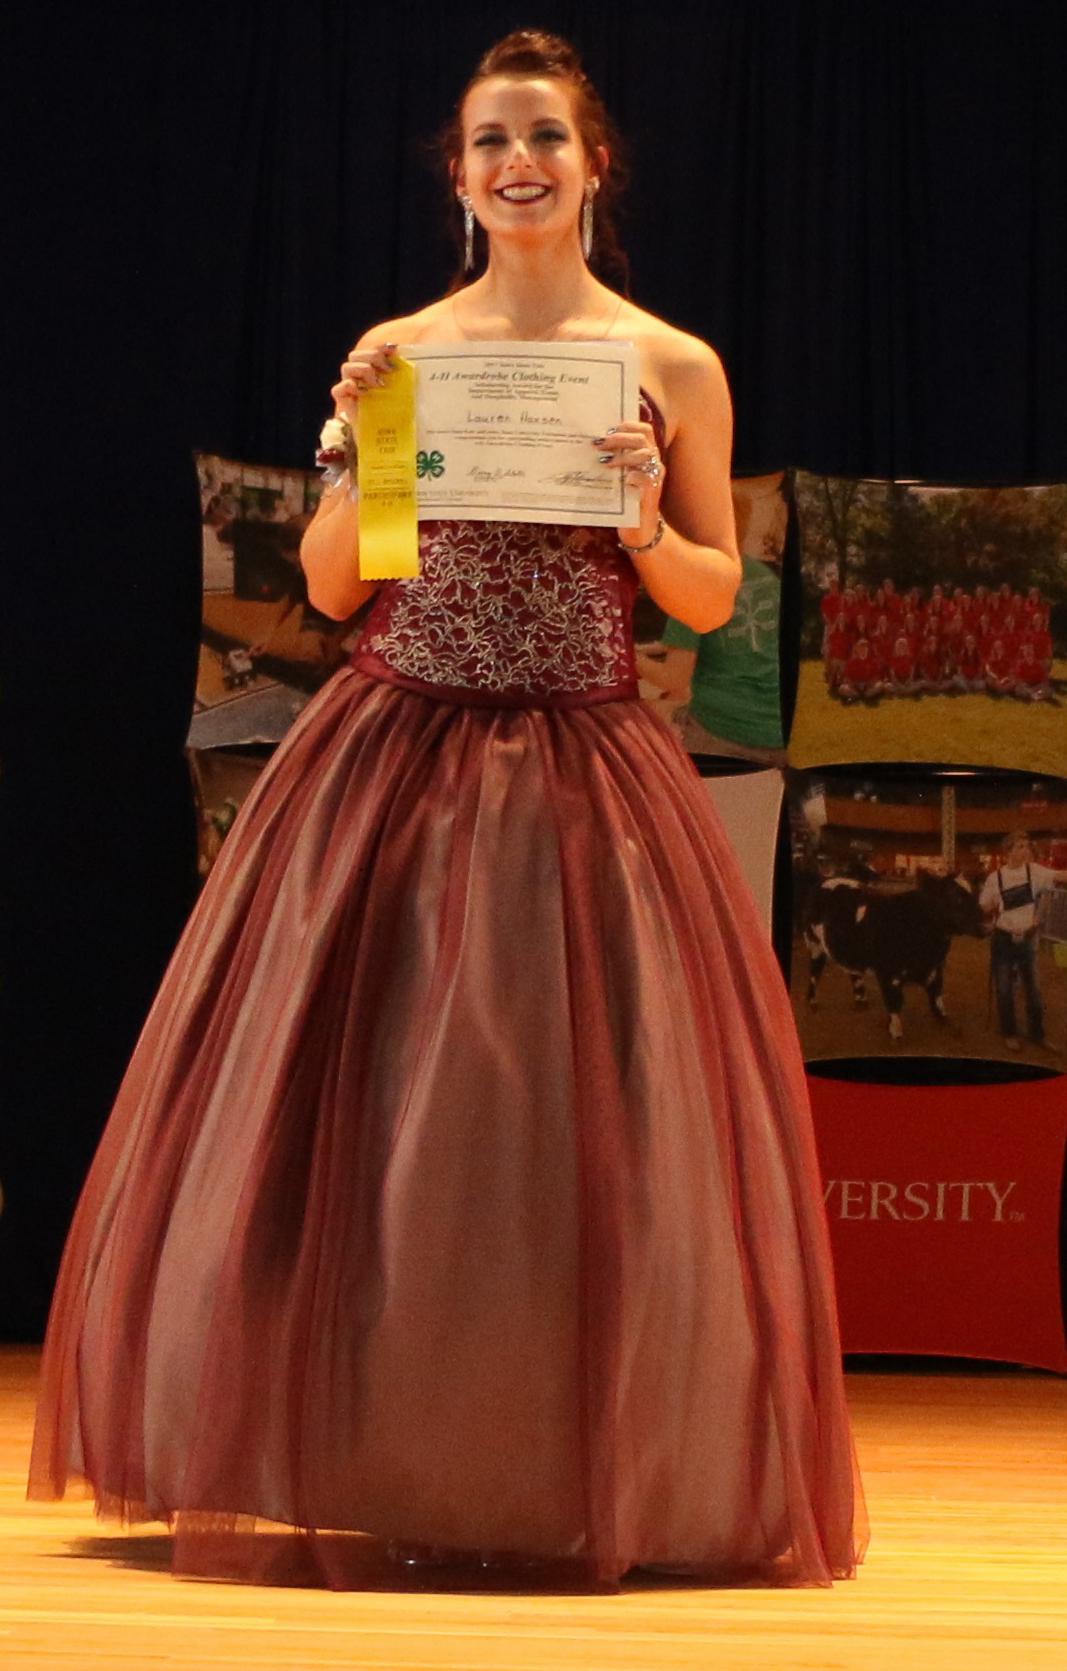 Iowa 4 H Awardrobe Clothing Event Award Winners Announced News